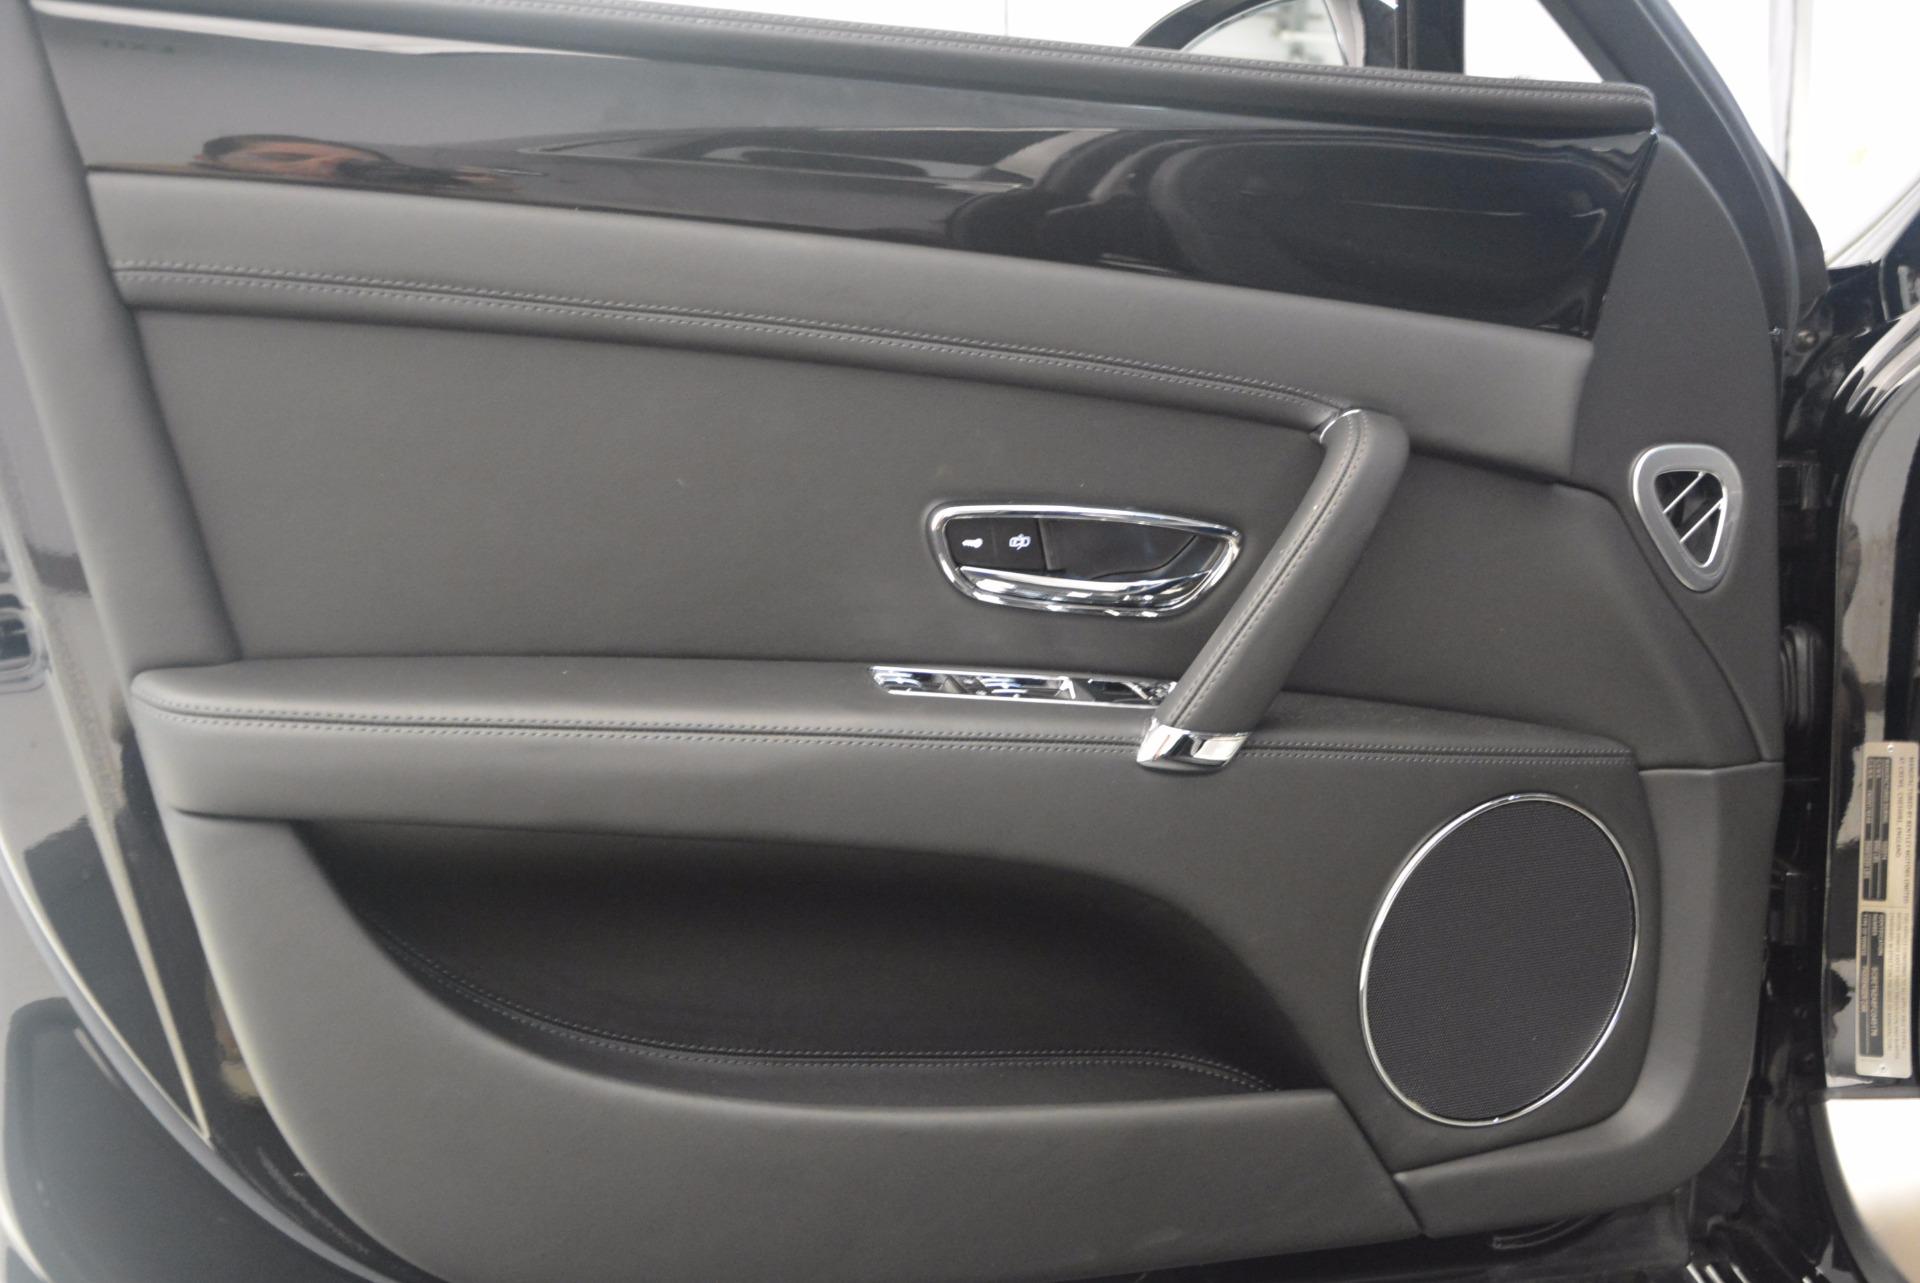 Used 2015 Bentley Flying Spur V8 For Sale In Westport, CT 1199_p20